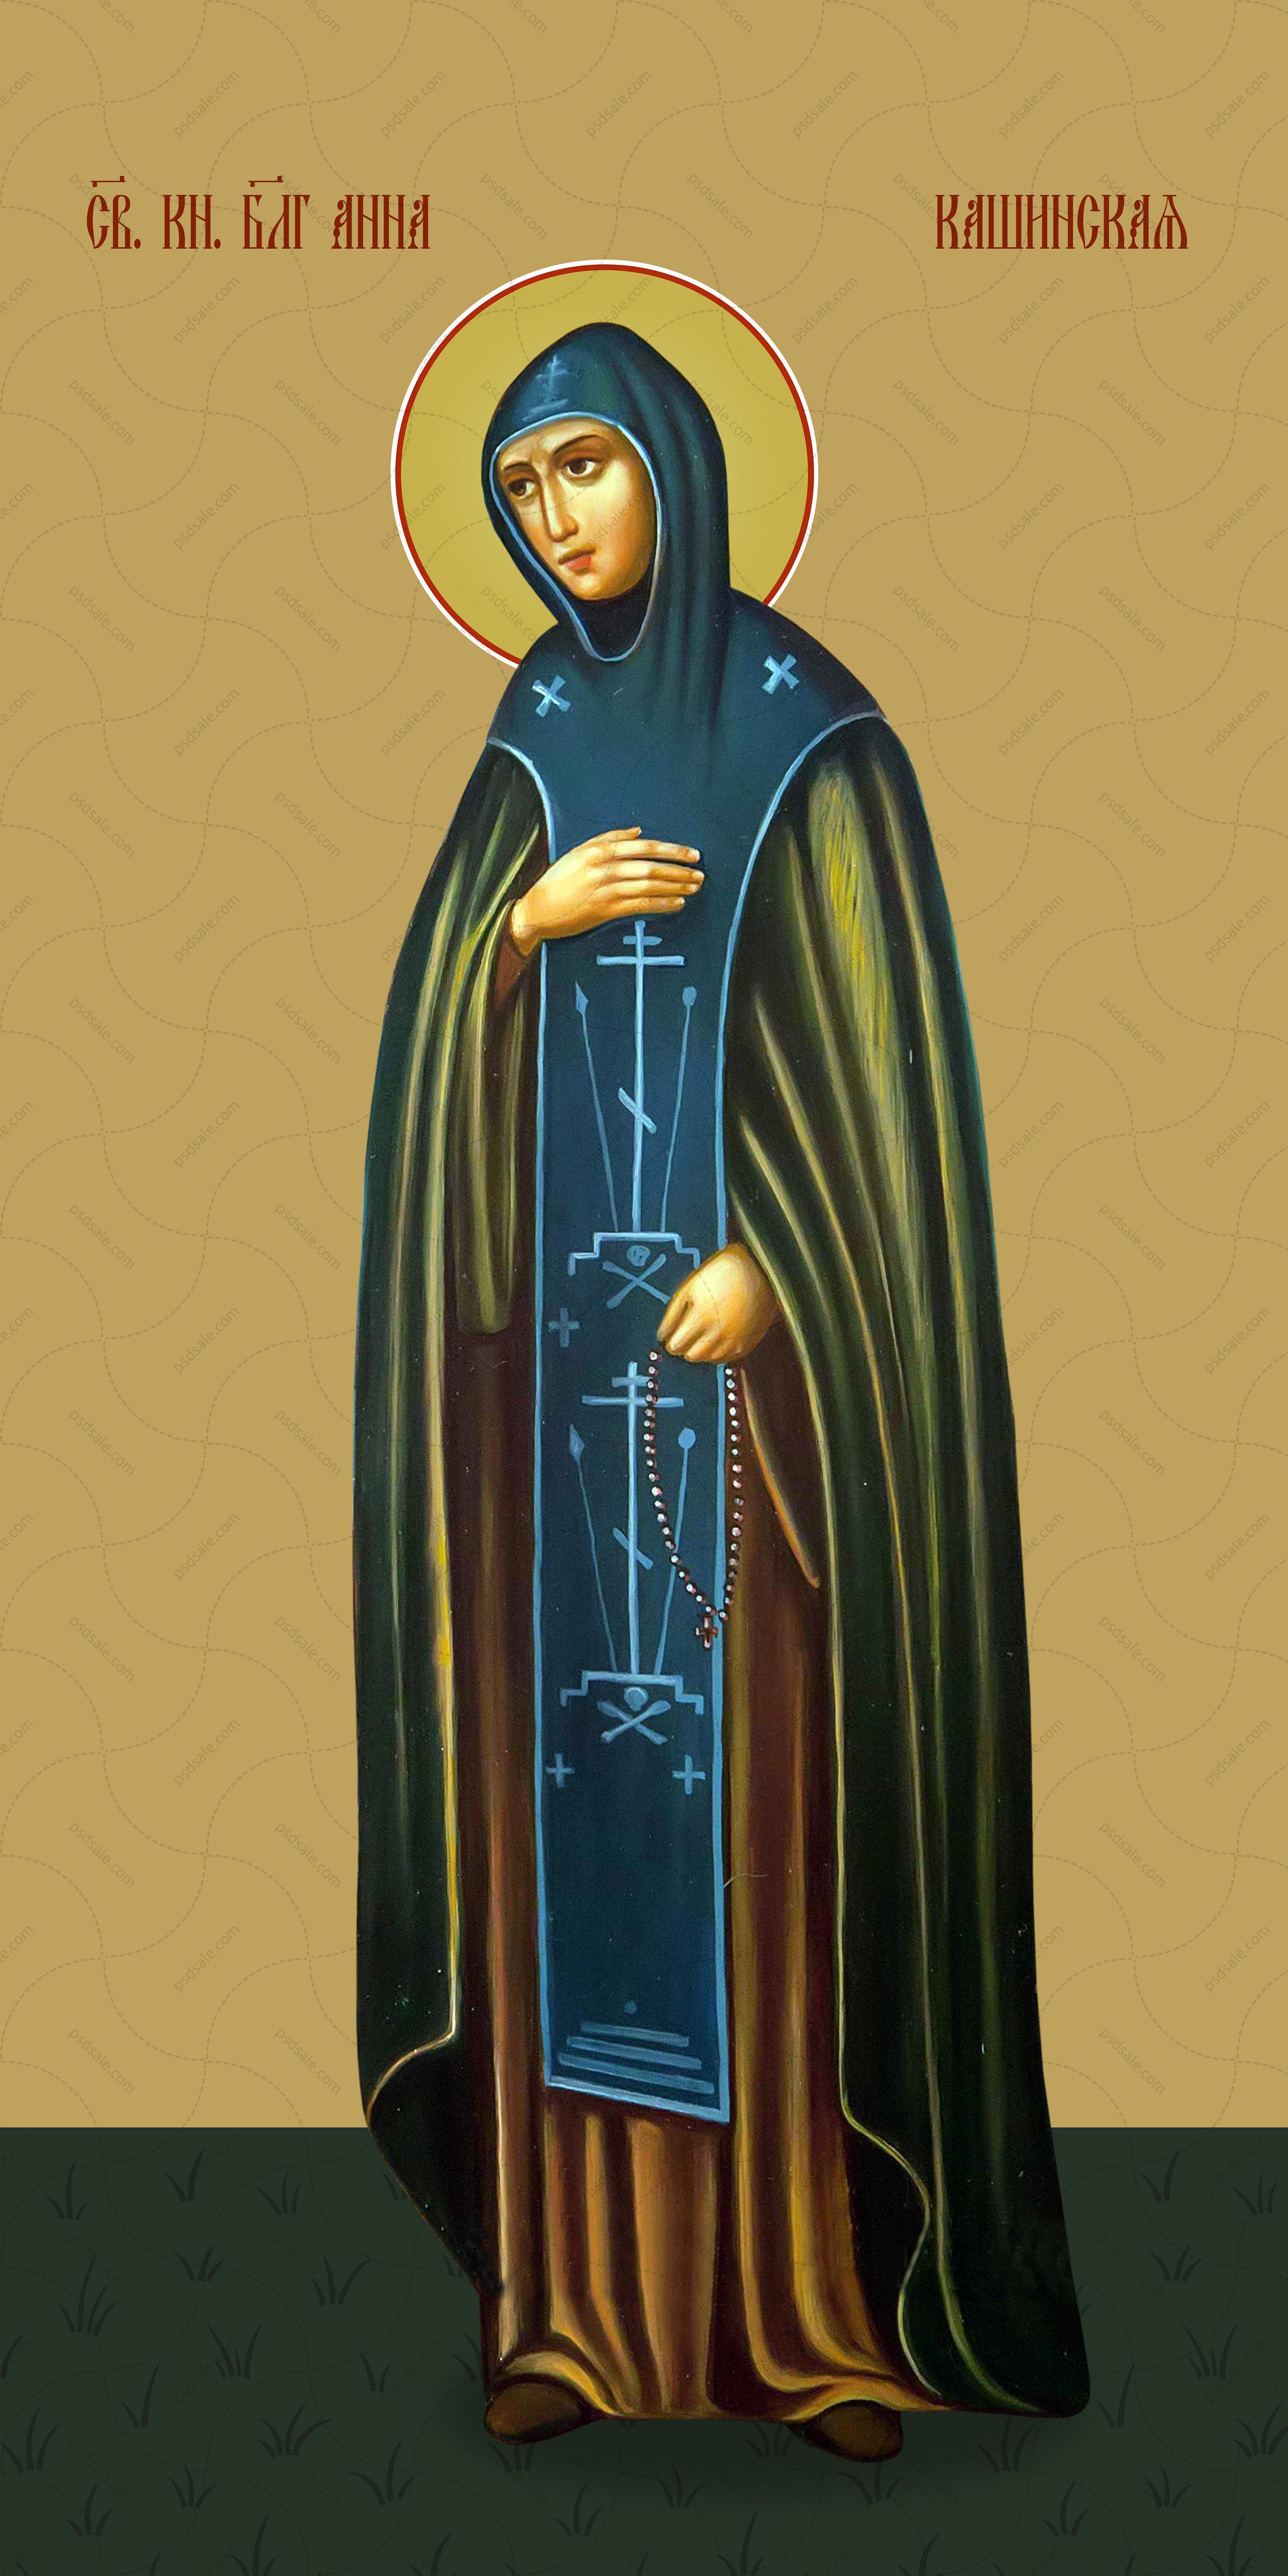 Мерная икона, Анна Кашинская, святая